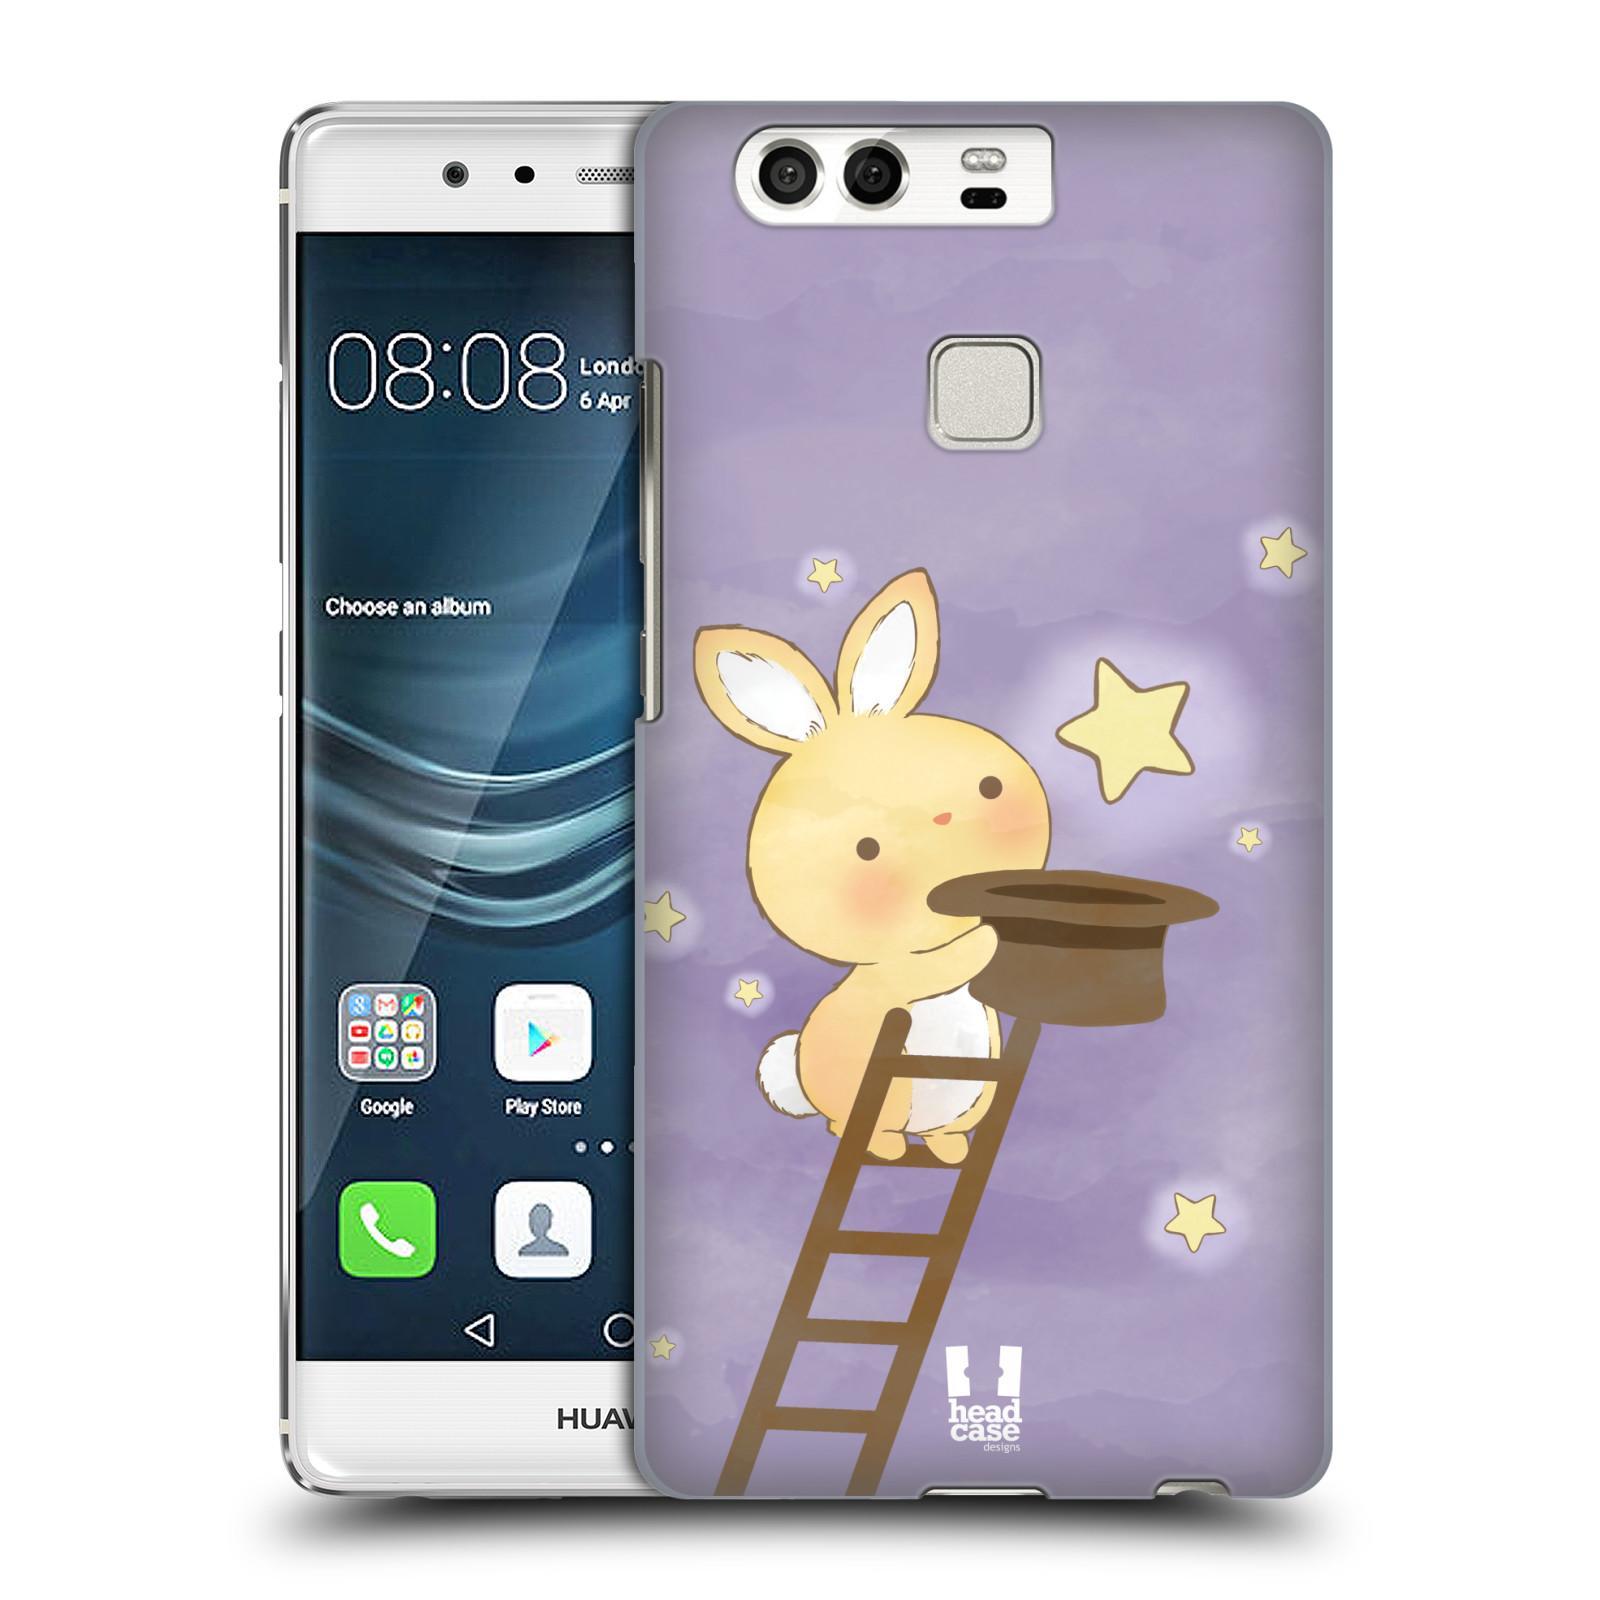 HEAD CASE plastový obal na mobil Huawei P9 / P9 DUAL SIM vzor králíček a hvězdy fialová